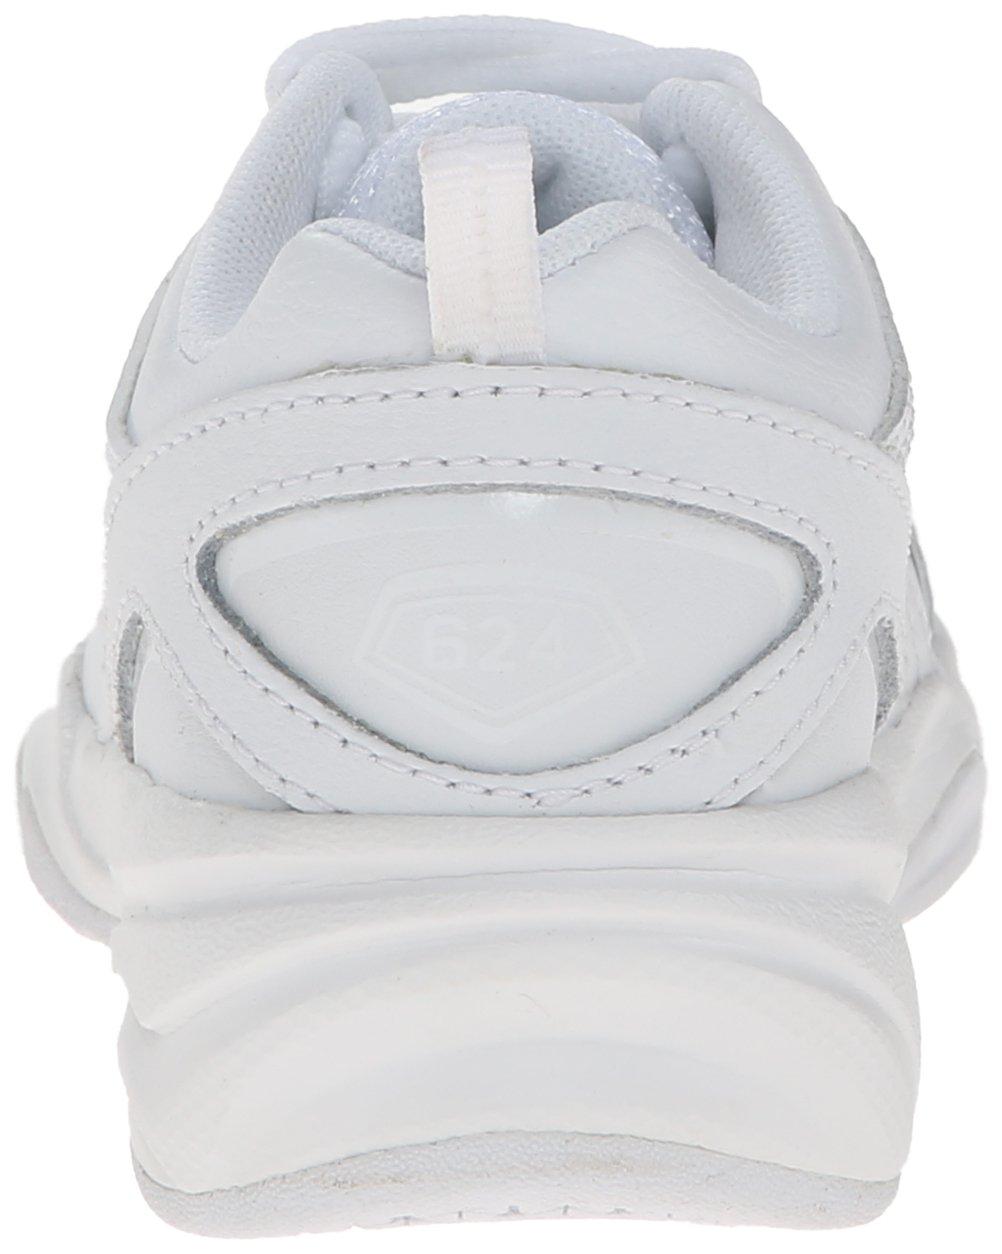 New Balance Boys KX624 Lace-Up Training Shoe ,White,13.5 M US Little Kid by New Balance (Image #2)